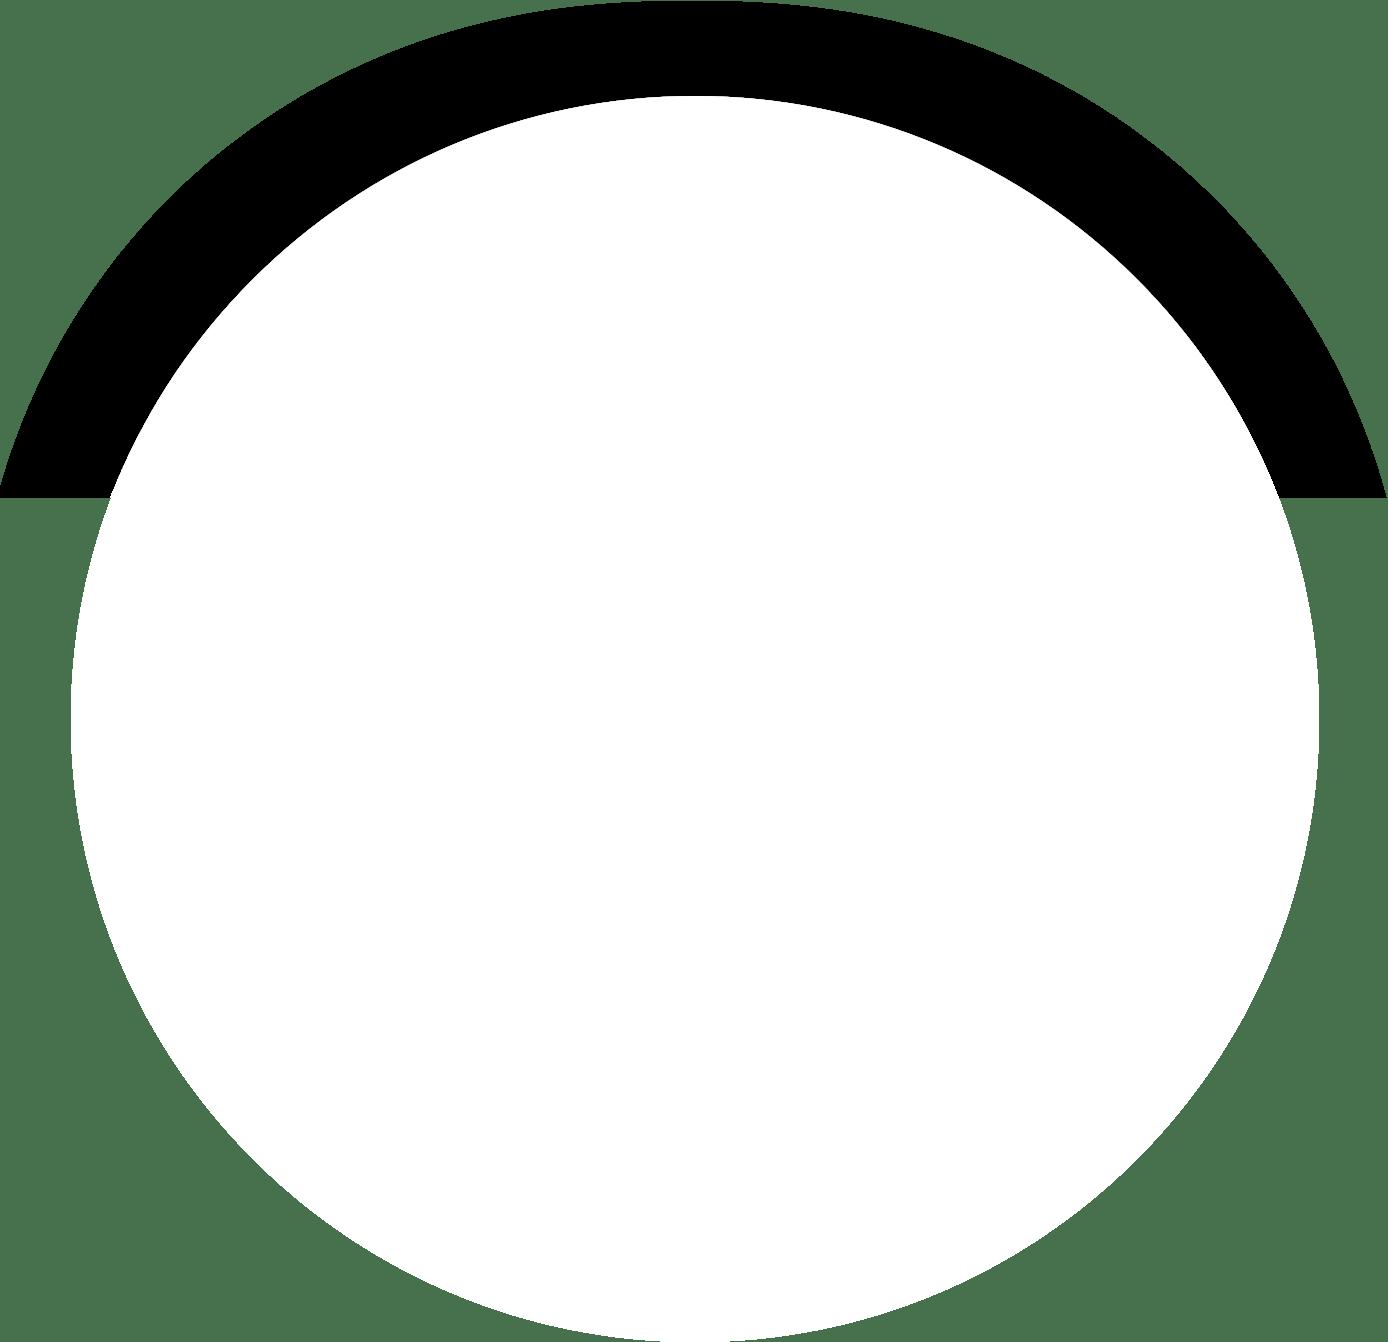 cirkel wit met shadow